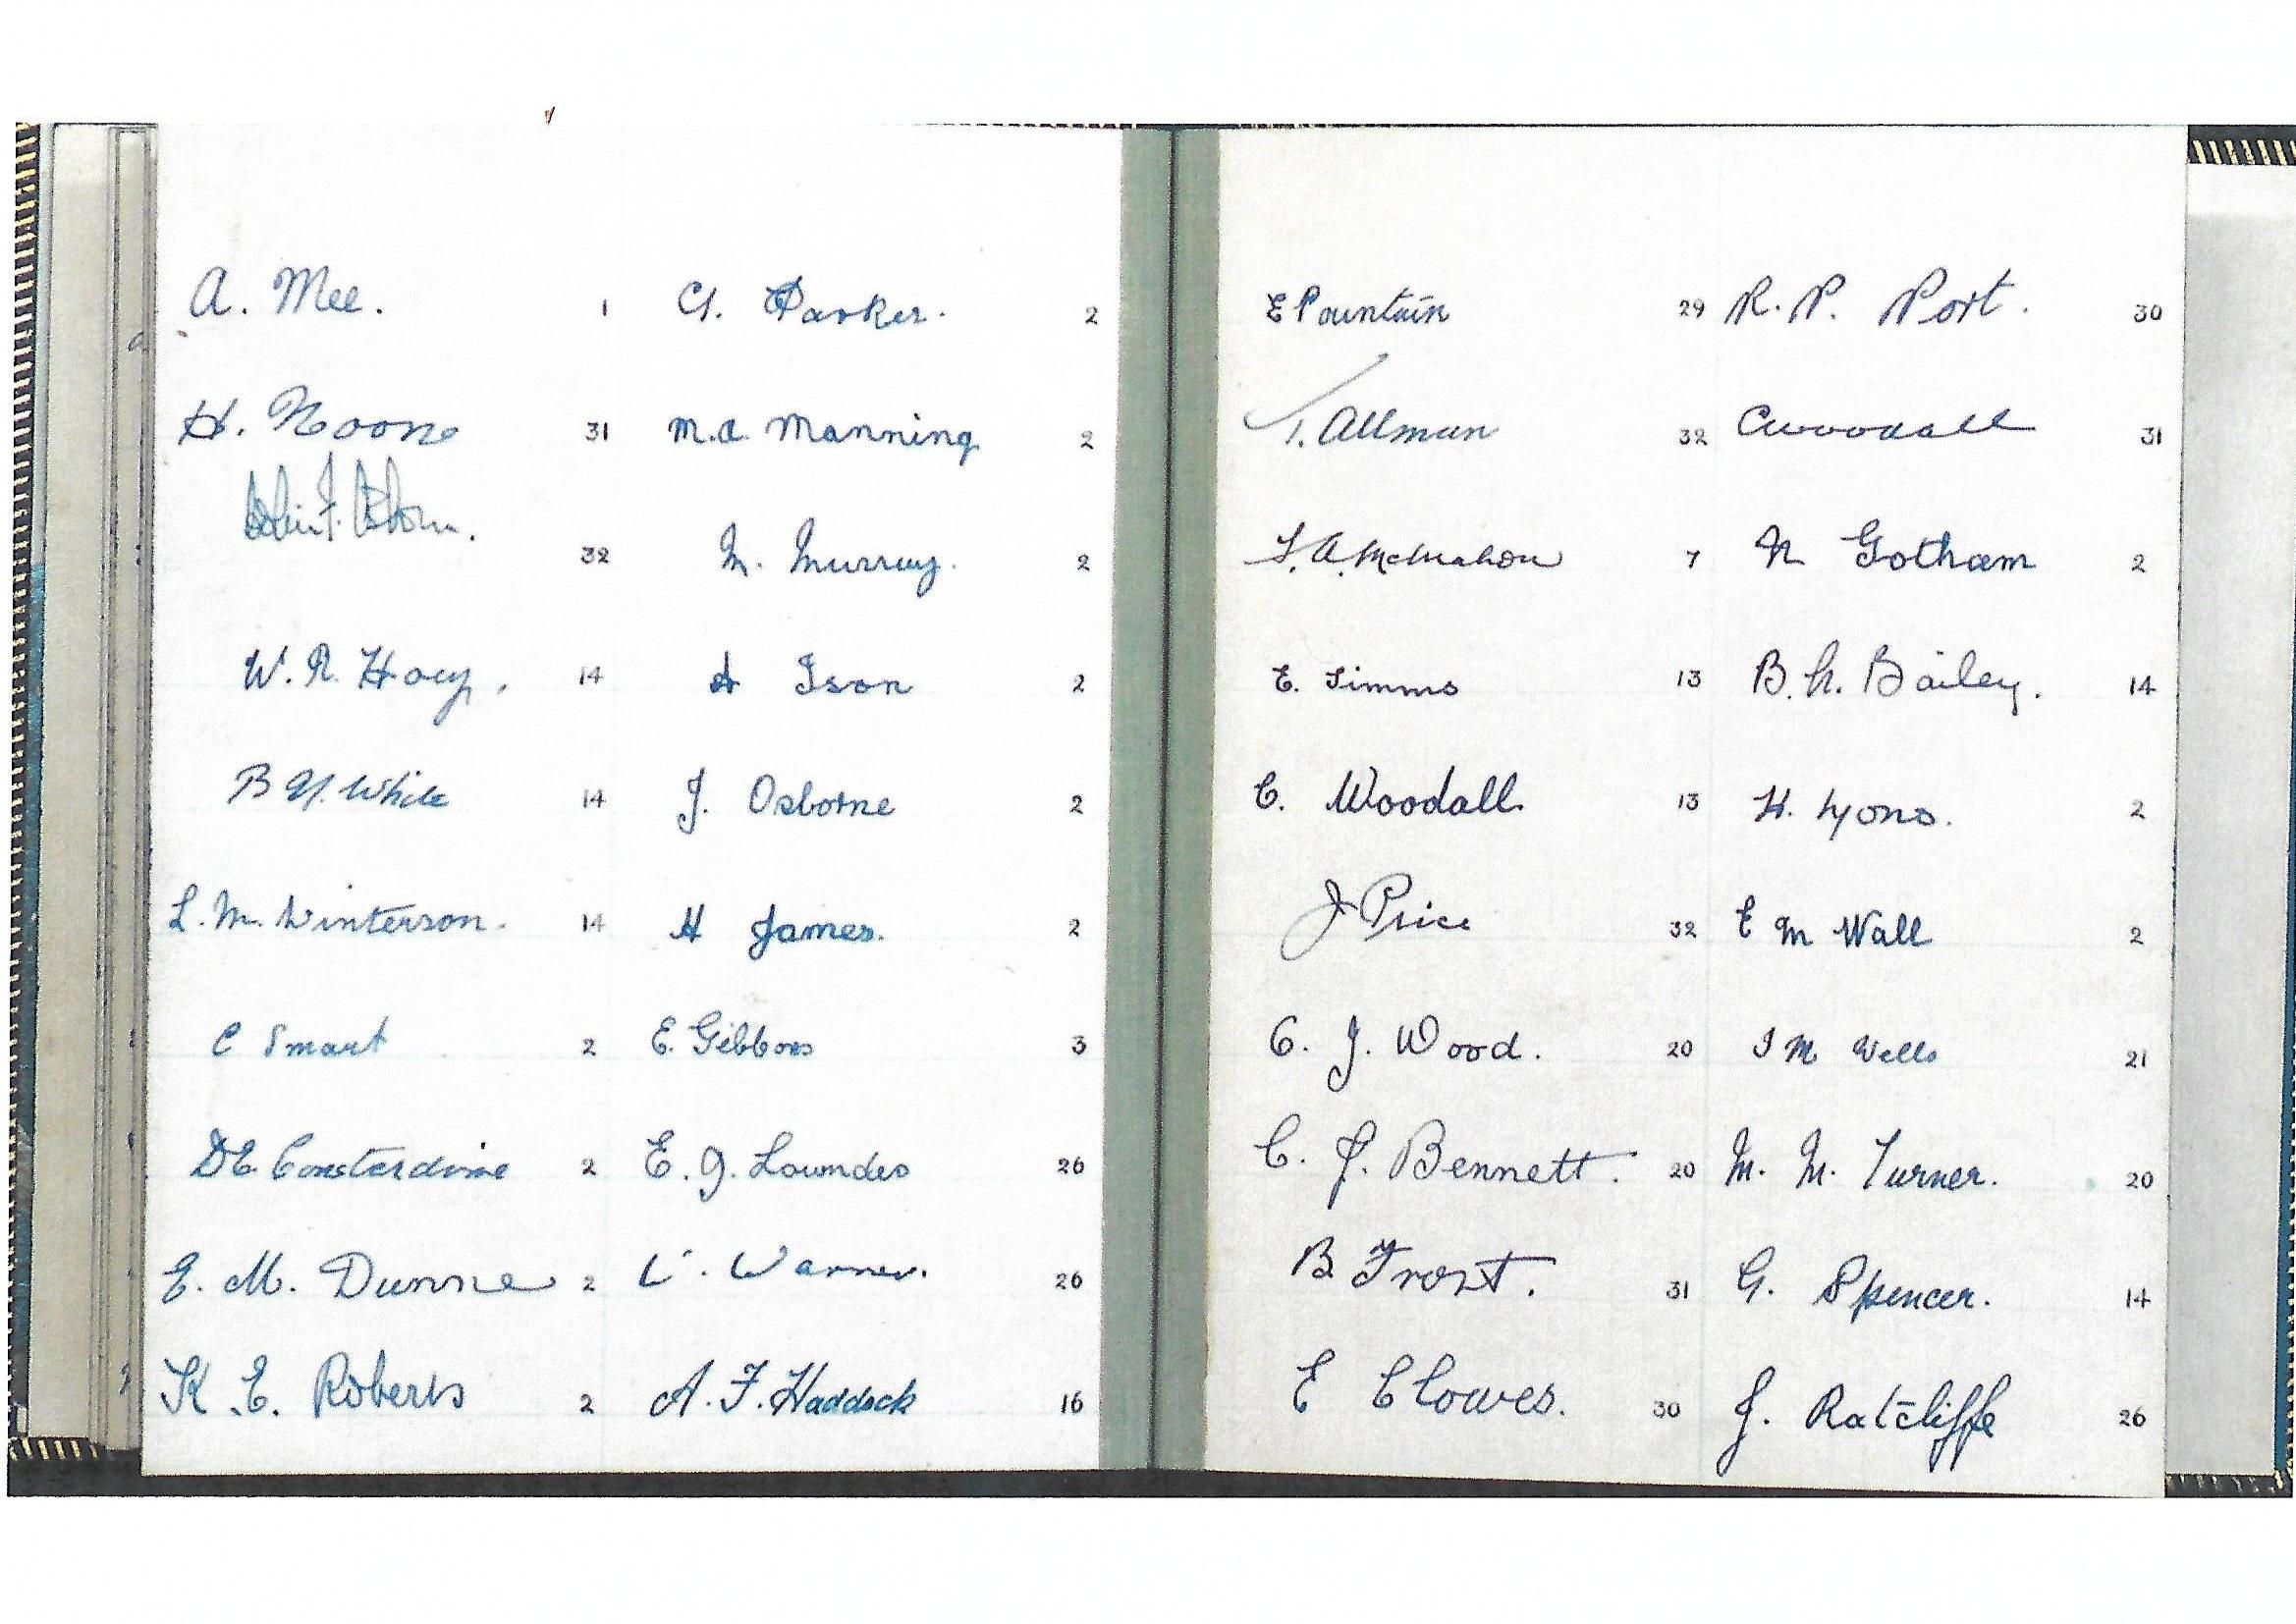 Staff List 1947